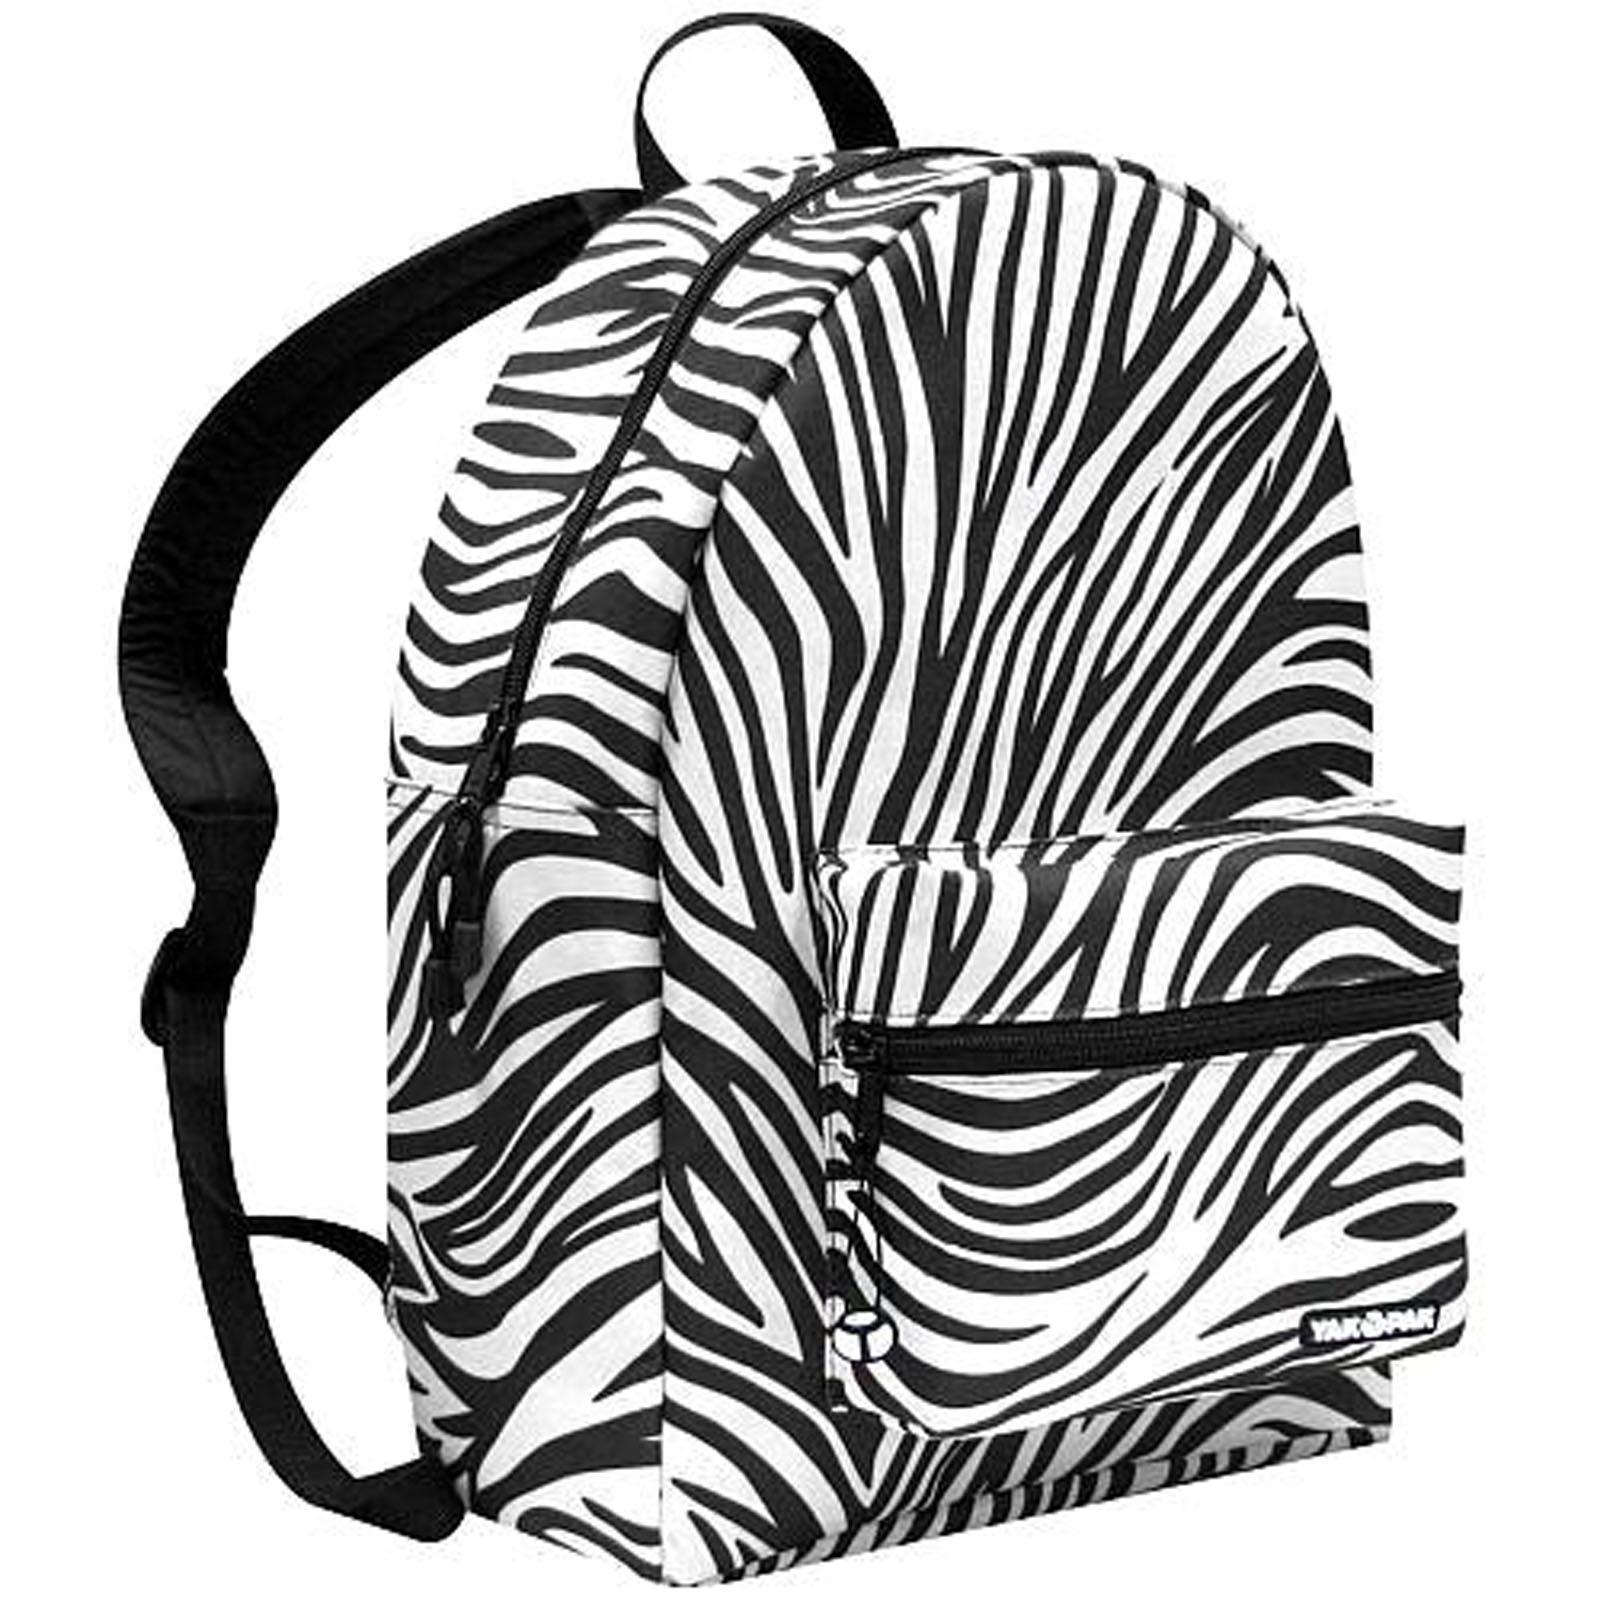 ... & White Zebra Print Deluxe Backpack Student School Laptop Book Bag